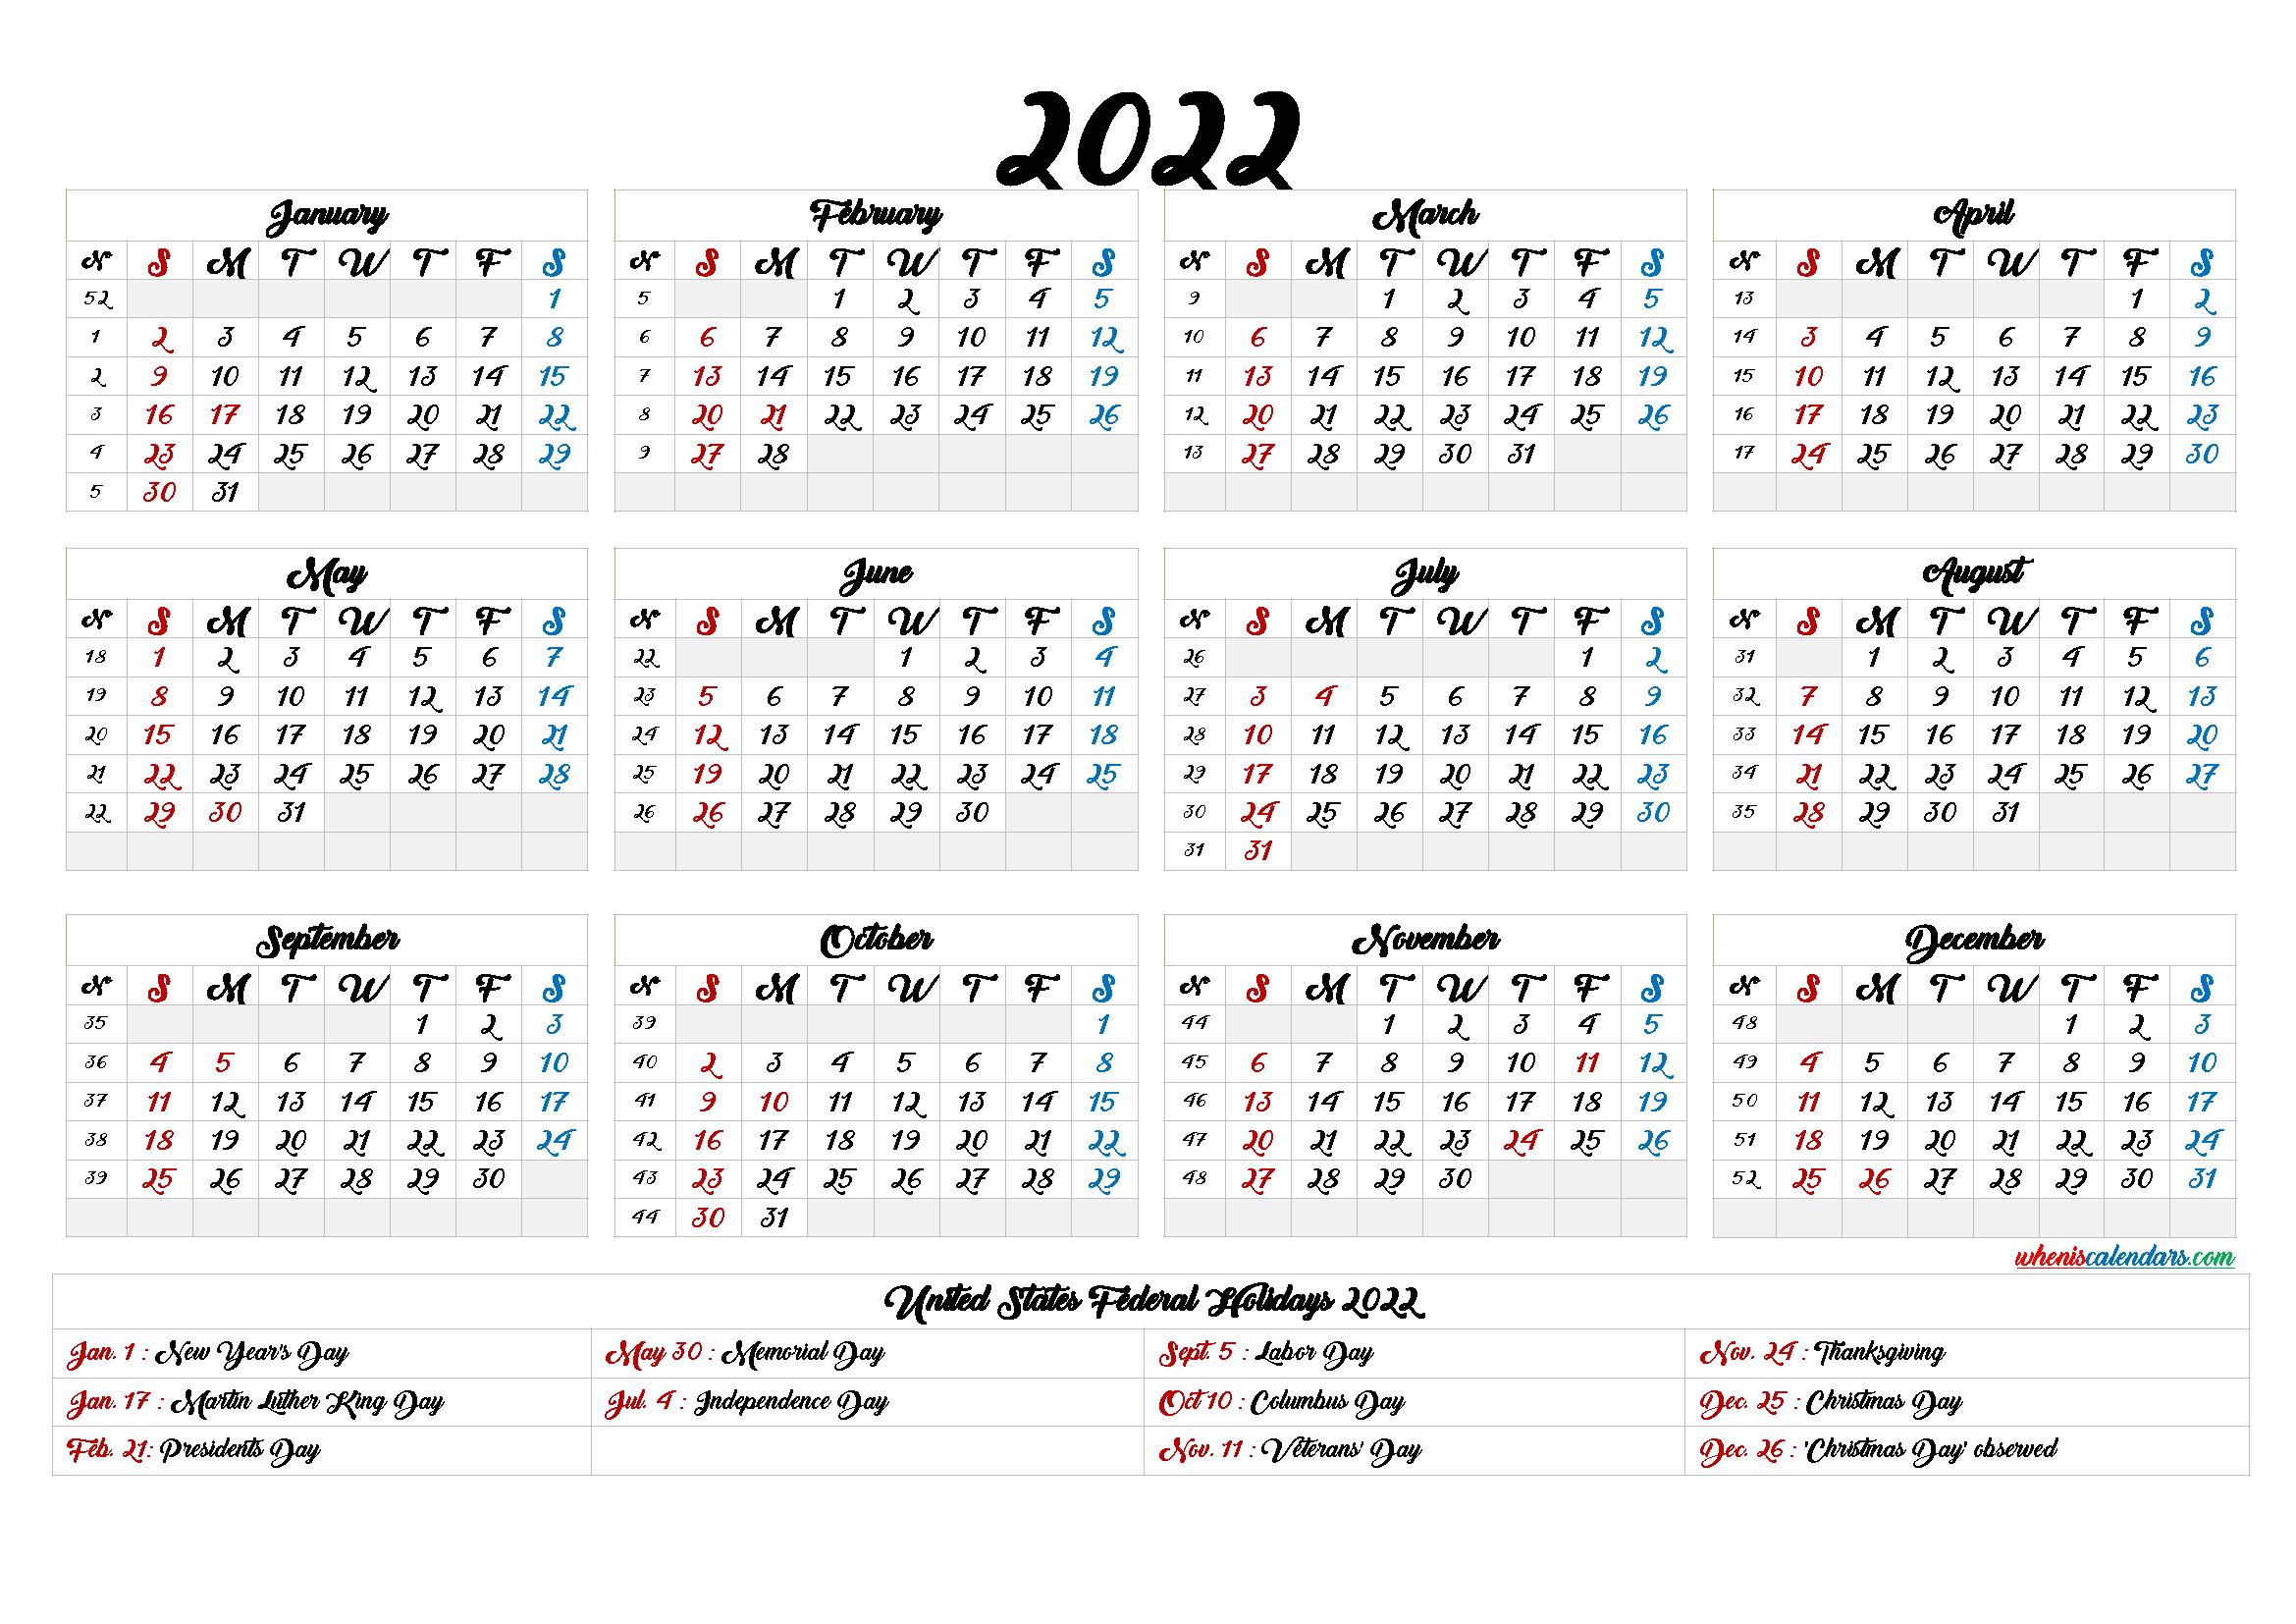 Printable Calendar 2022 With Holidays - 6 Templates throughout Free Printable 2022 Planner With Holidays Graphics